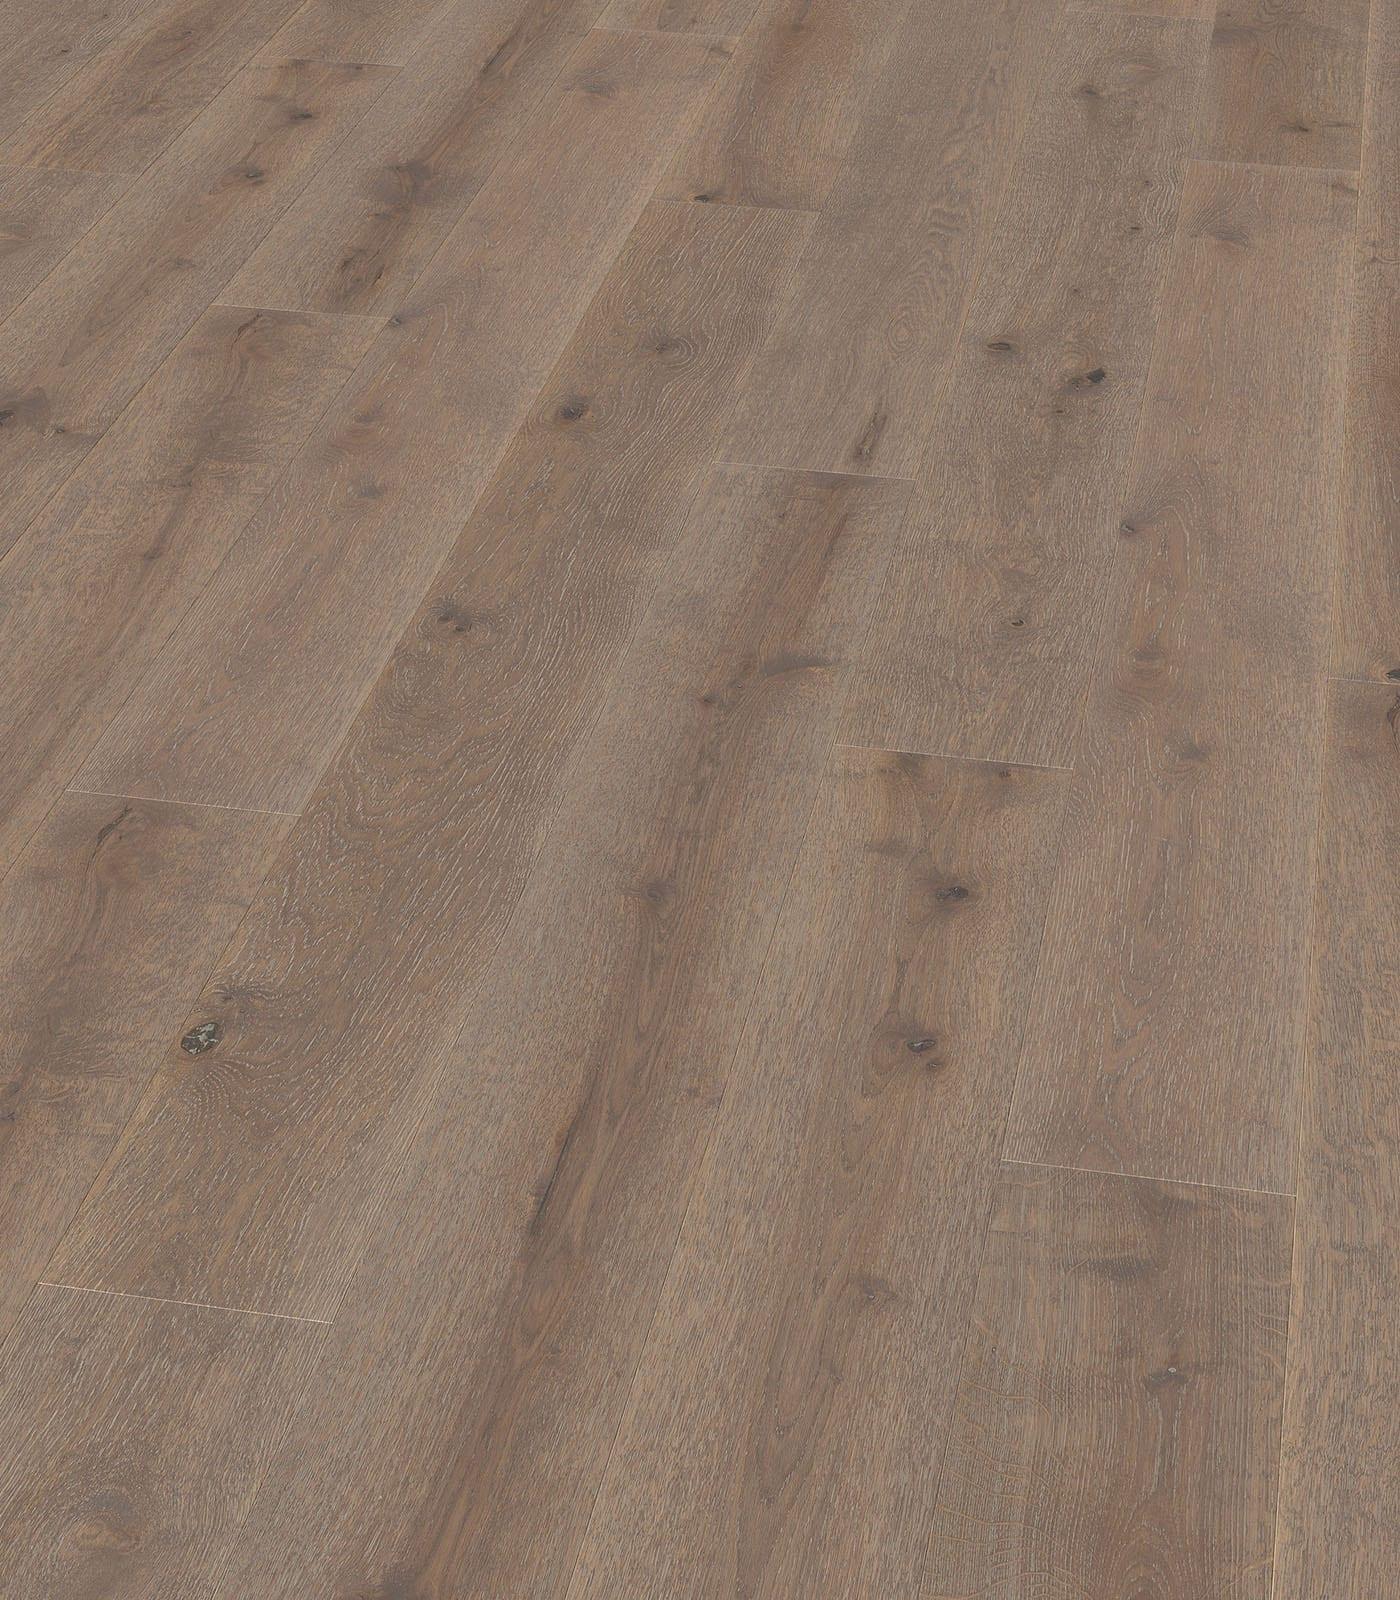 Fleur de Sel-European Oak floors-Colors collection-angle